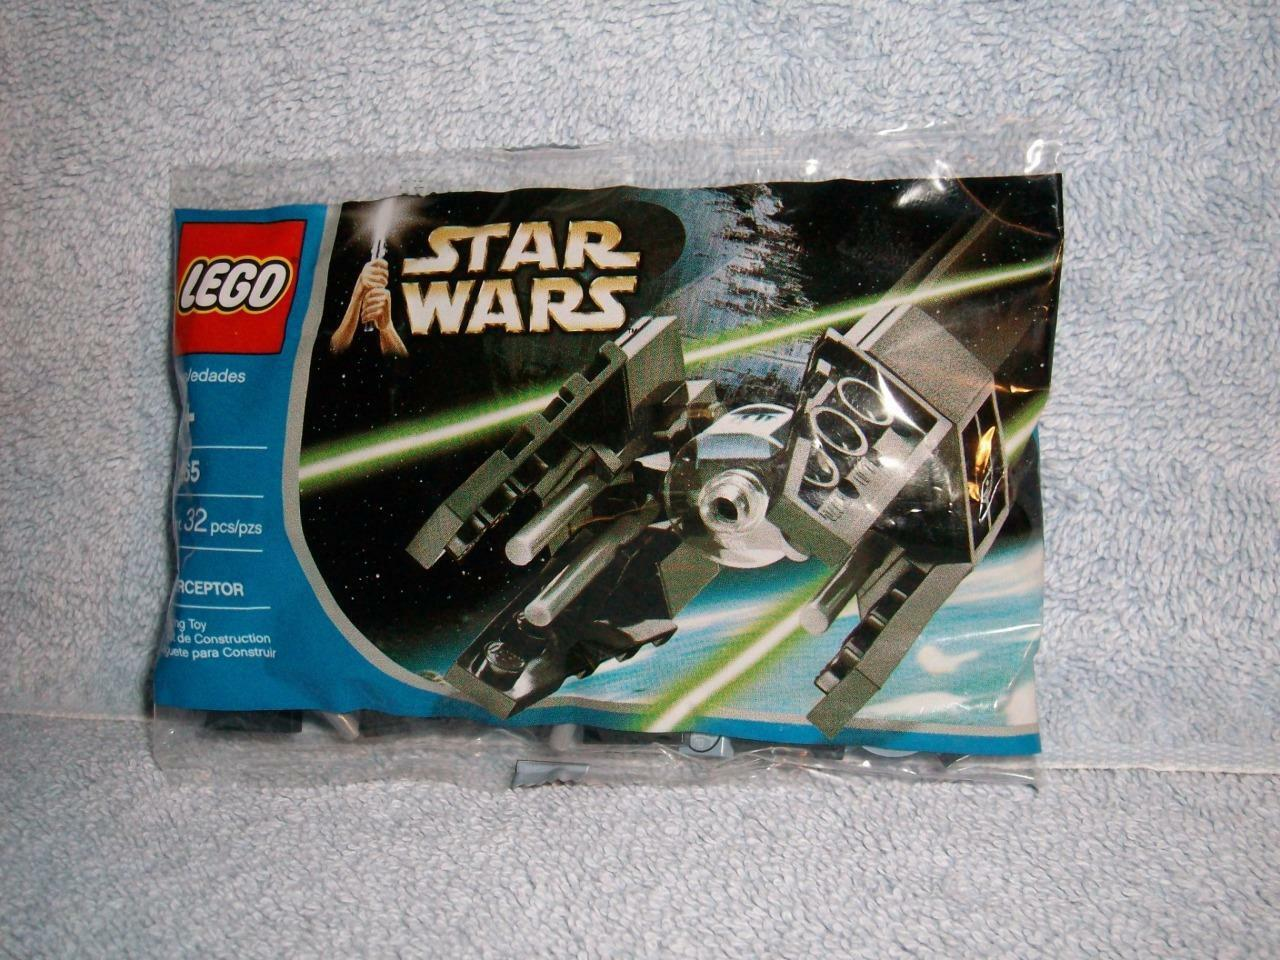 Mini Tie Interceptor Lego Star Wars Episode VI Return Jedi 6965 32 pcs 2005 New